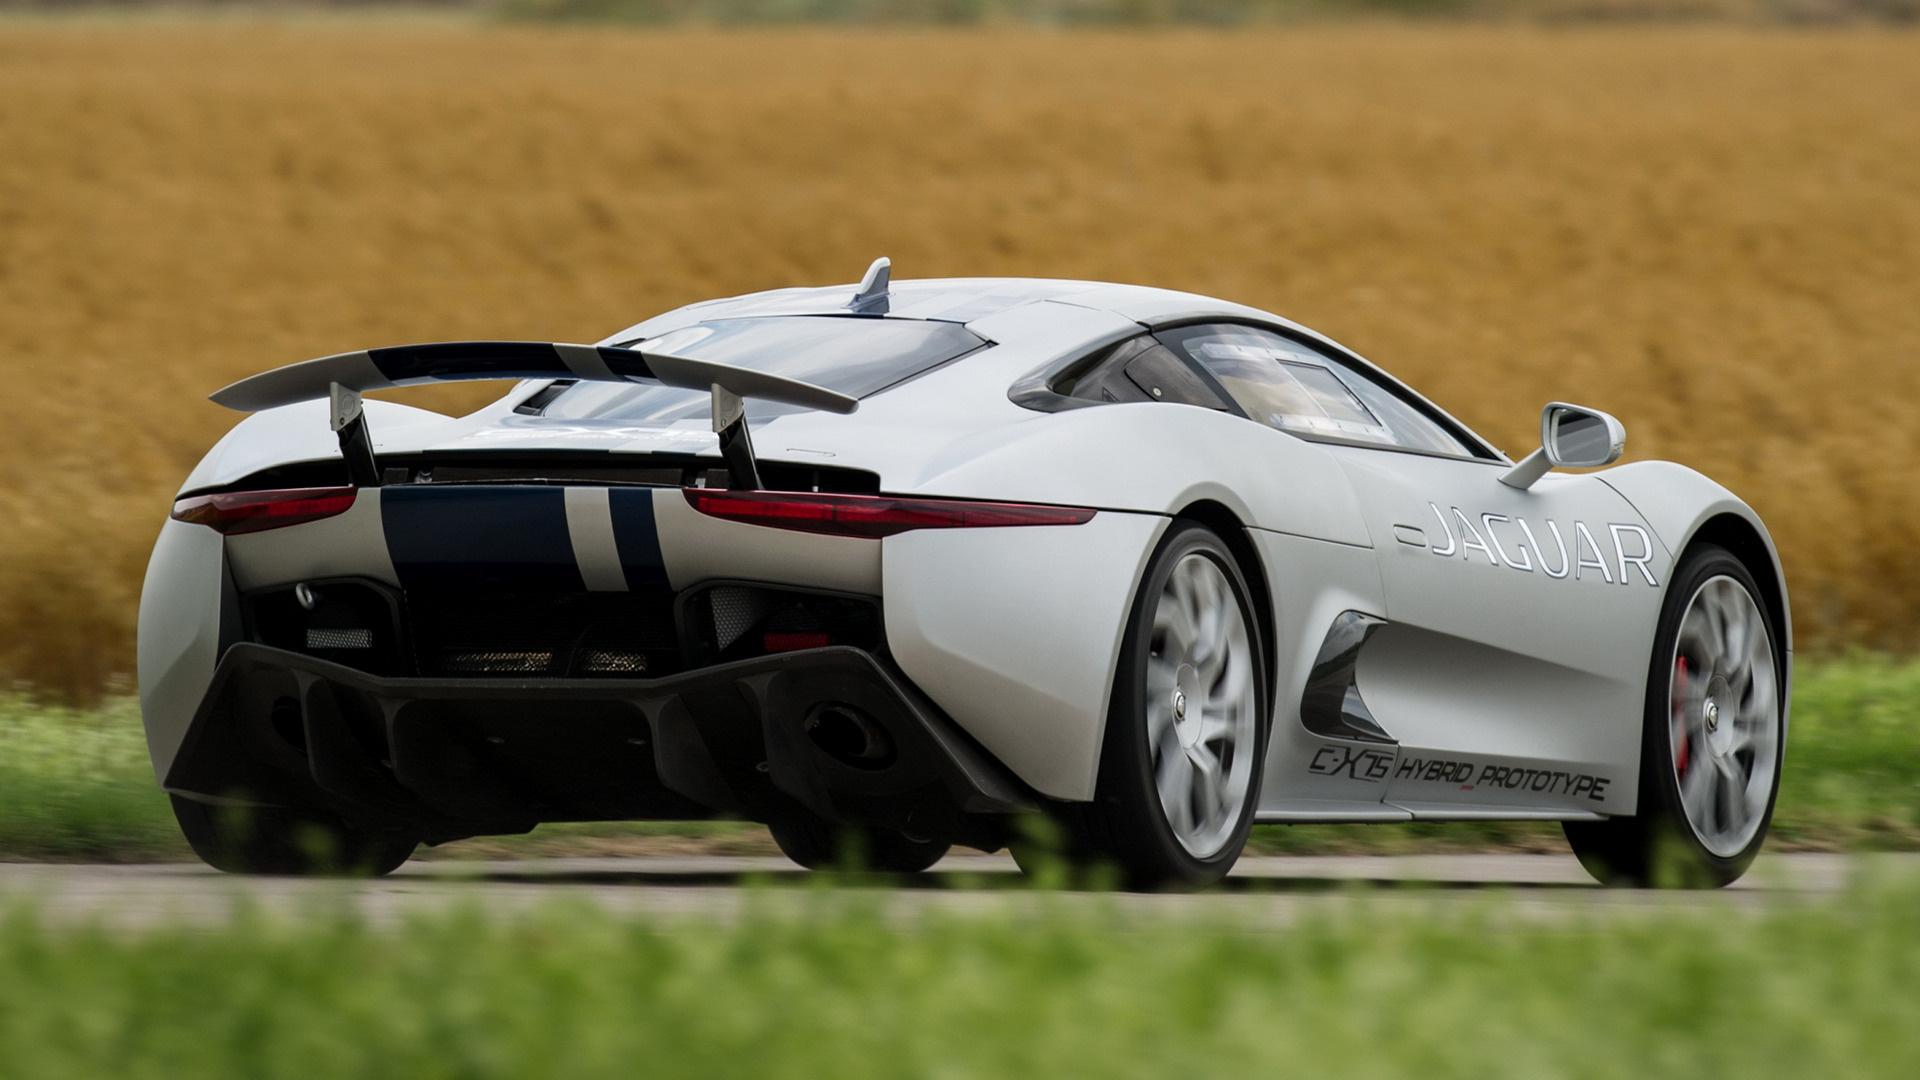 2013 Jaguar C-X75 Hybrid Prototype - Wallpapers and HD ...